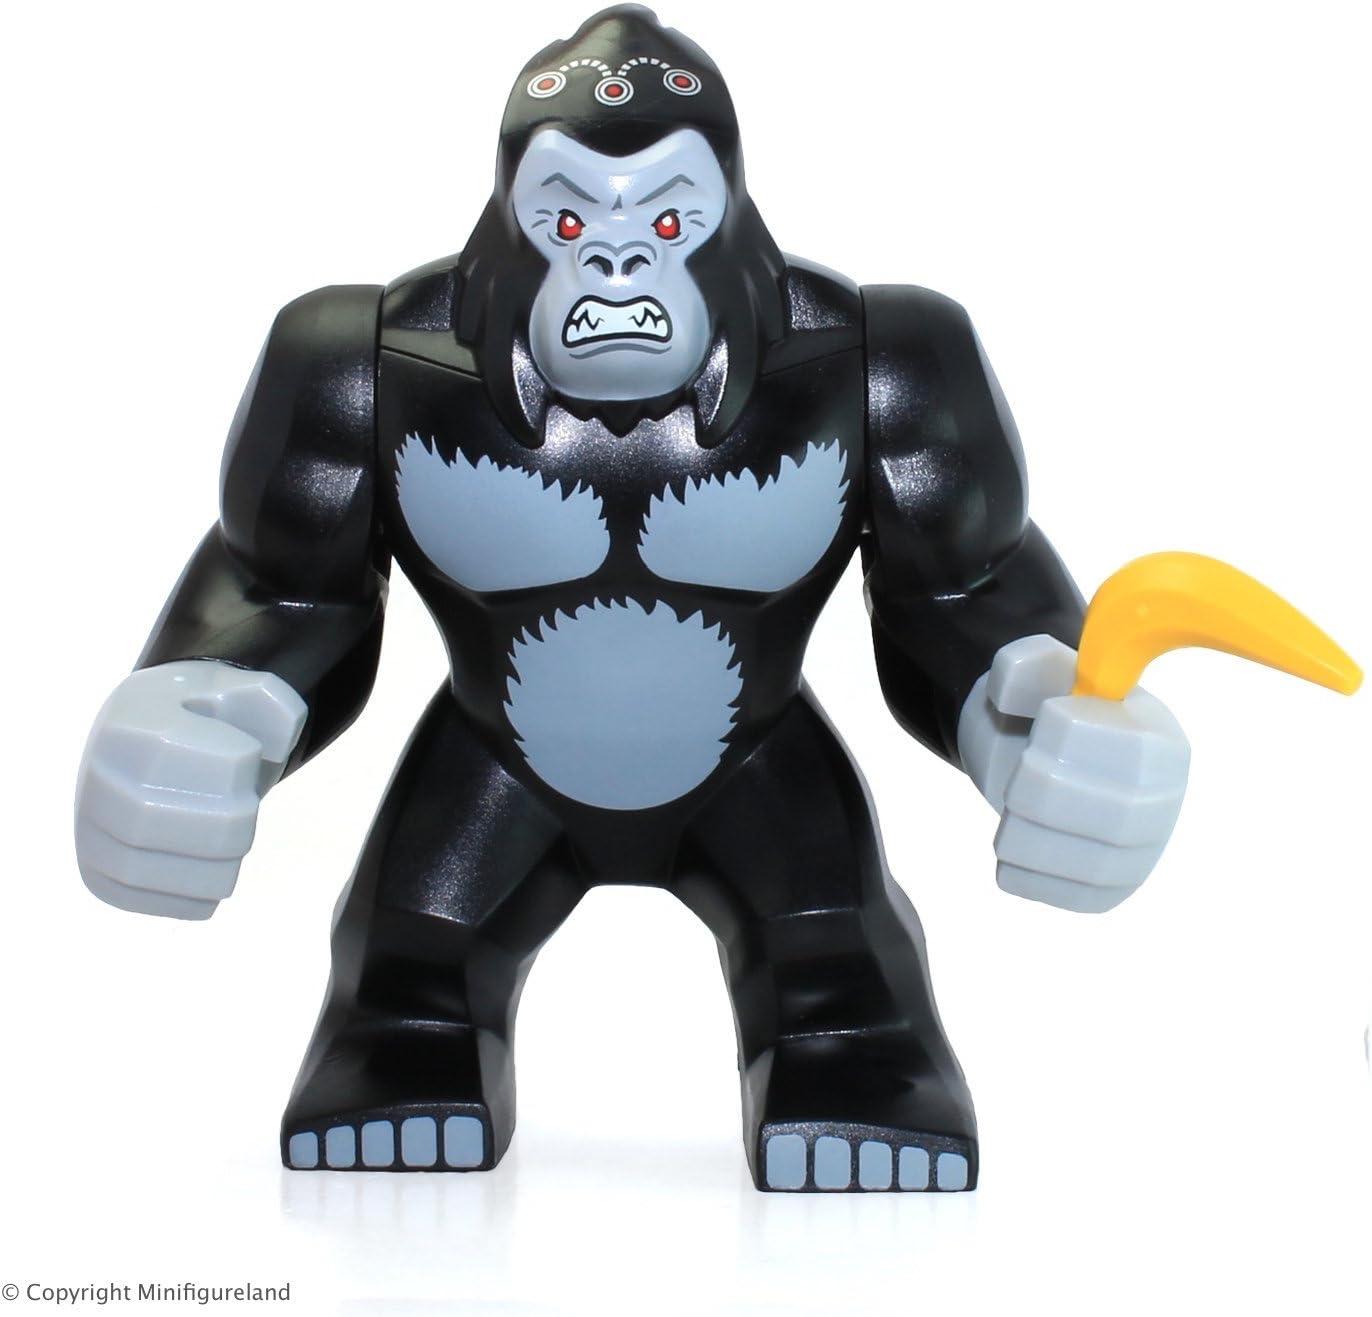 LEGO DC Comics Marvel Super Heroes Minifigure - Gorilla Grodd (76026)